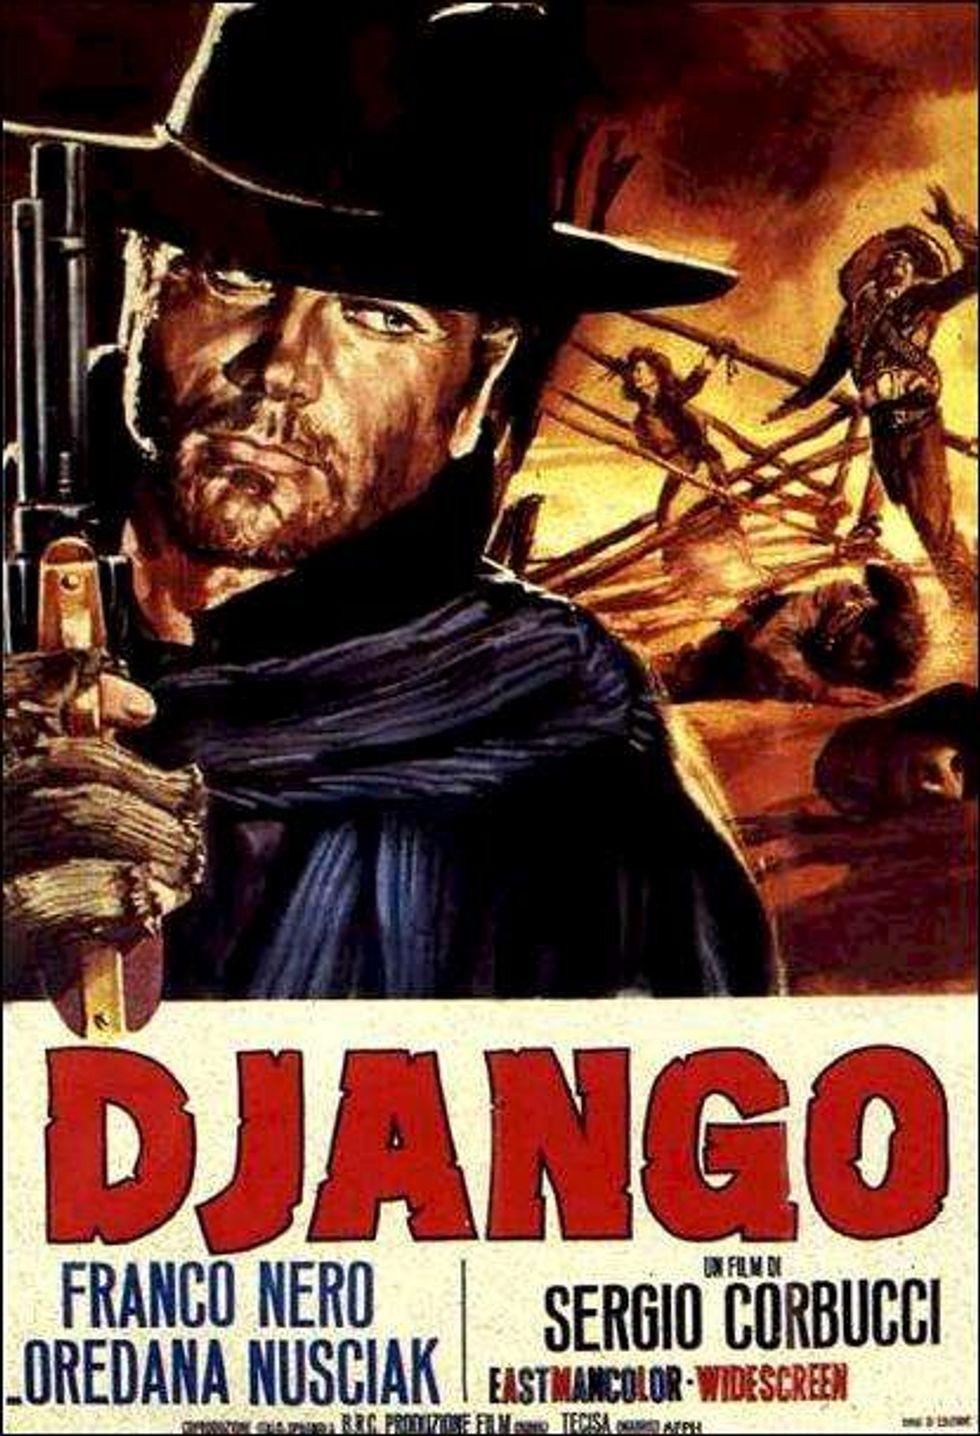 Sublimely Sardonic Spaghetti Western Django On Blu-ray!